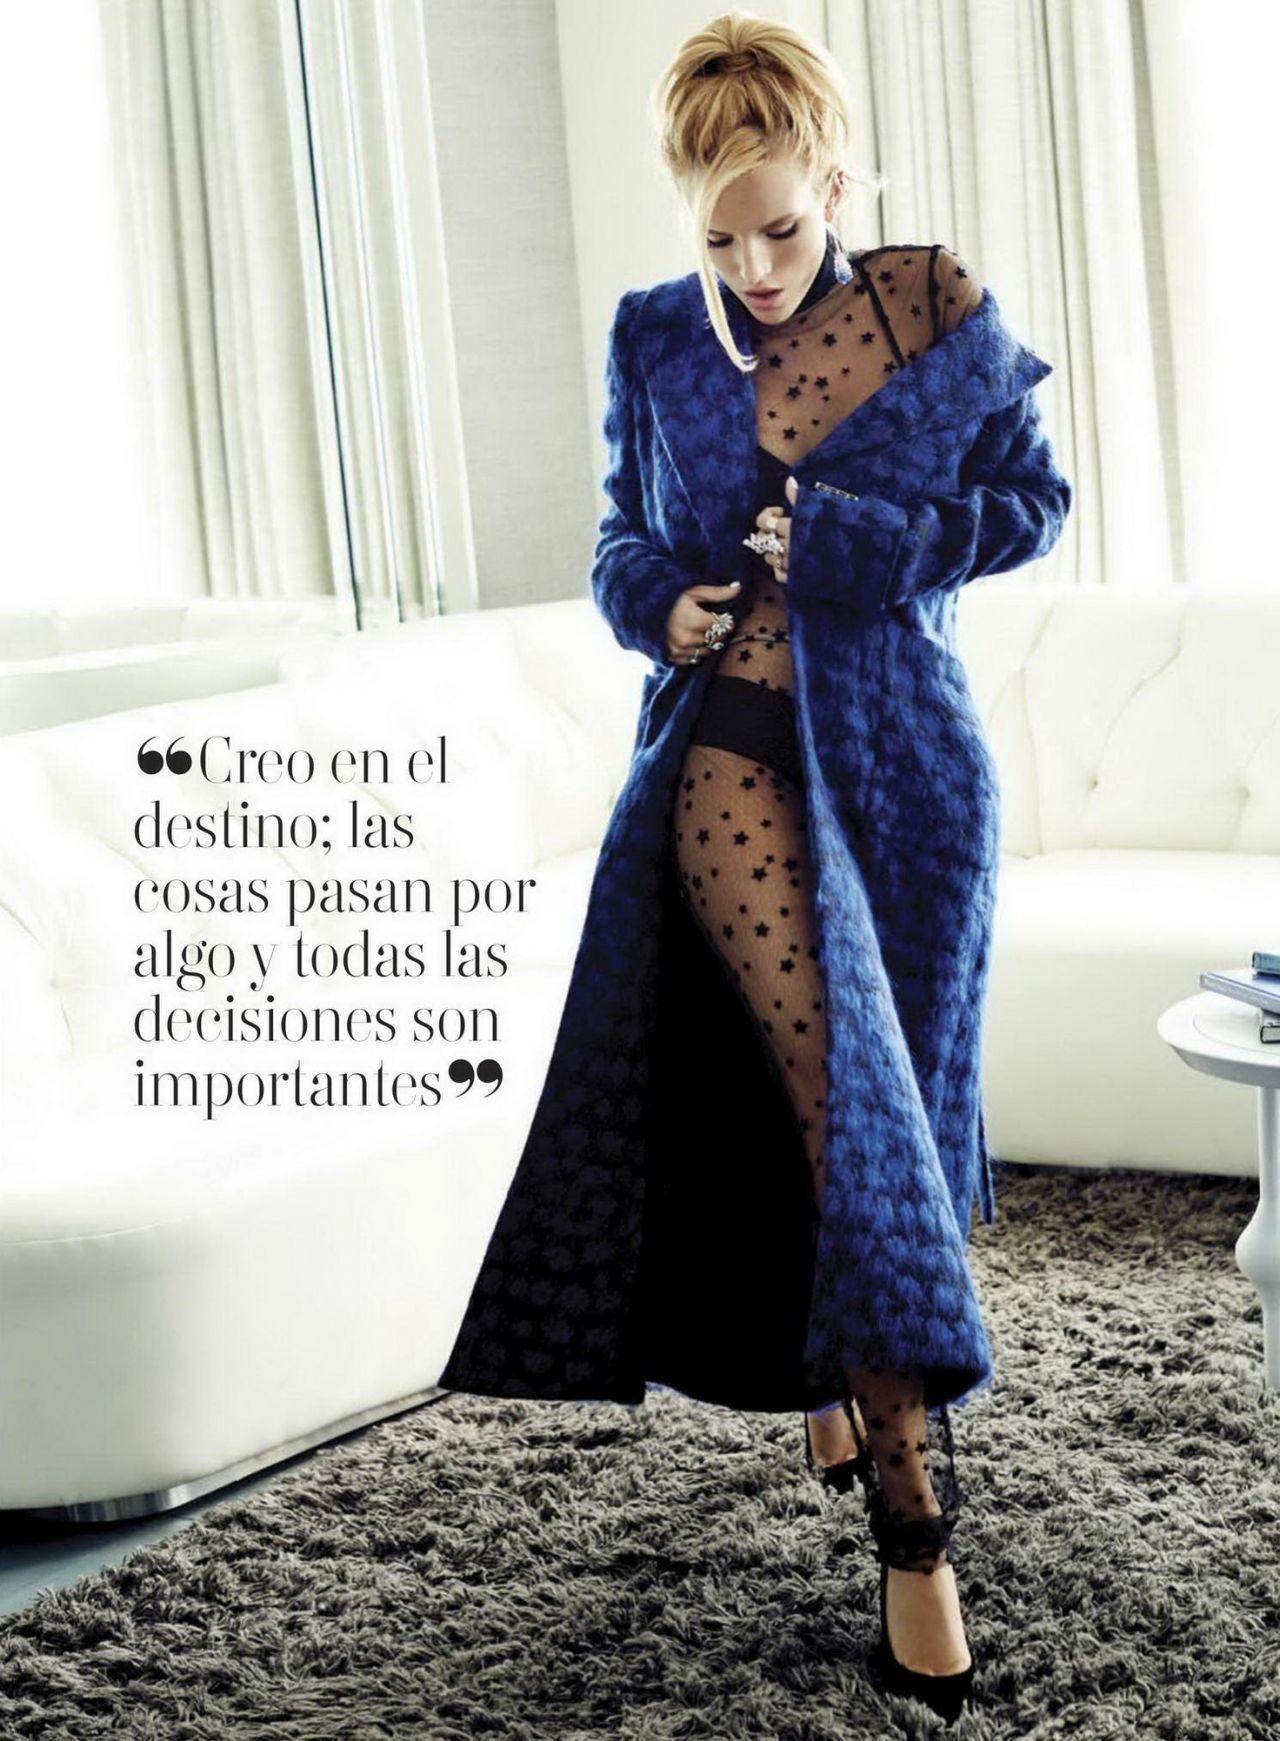 Bella Thorne Glamour Magazine Mexico December 2015 Issue